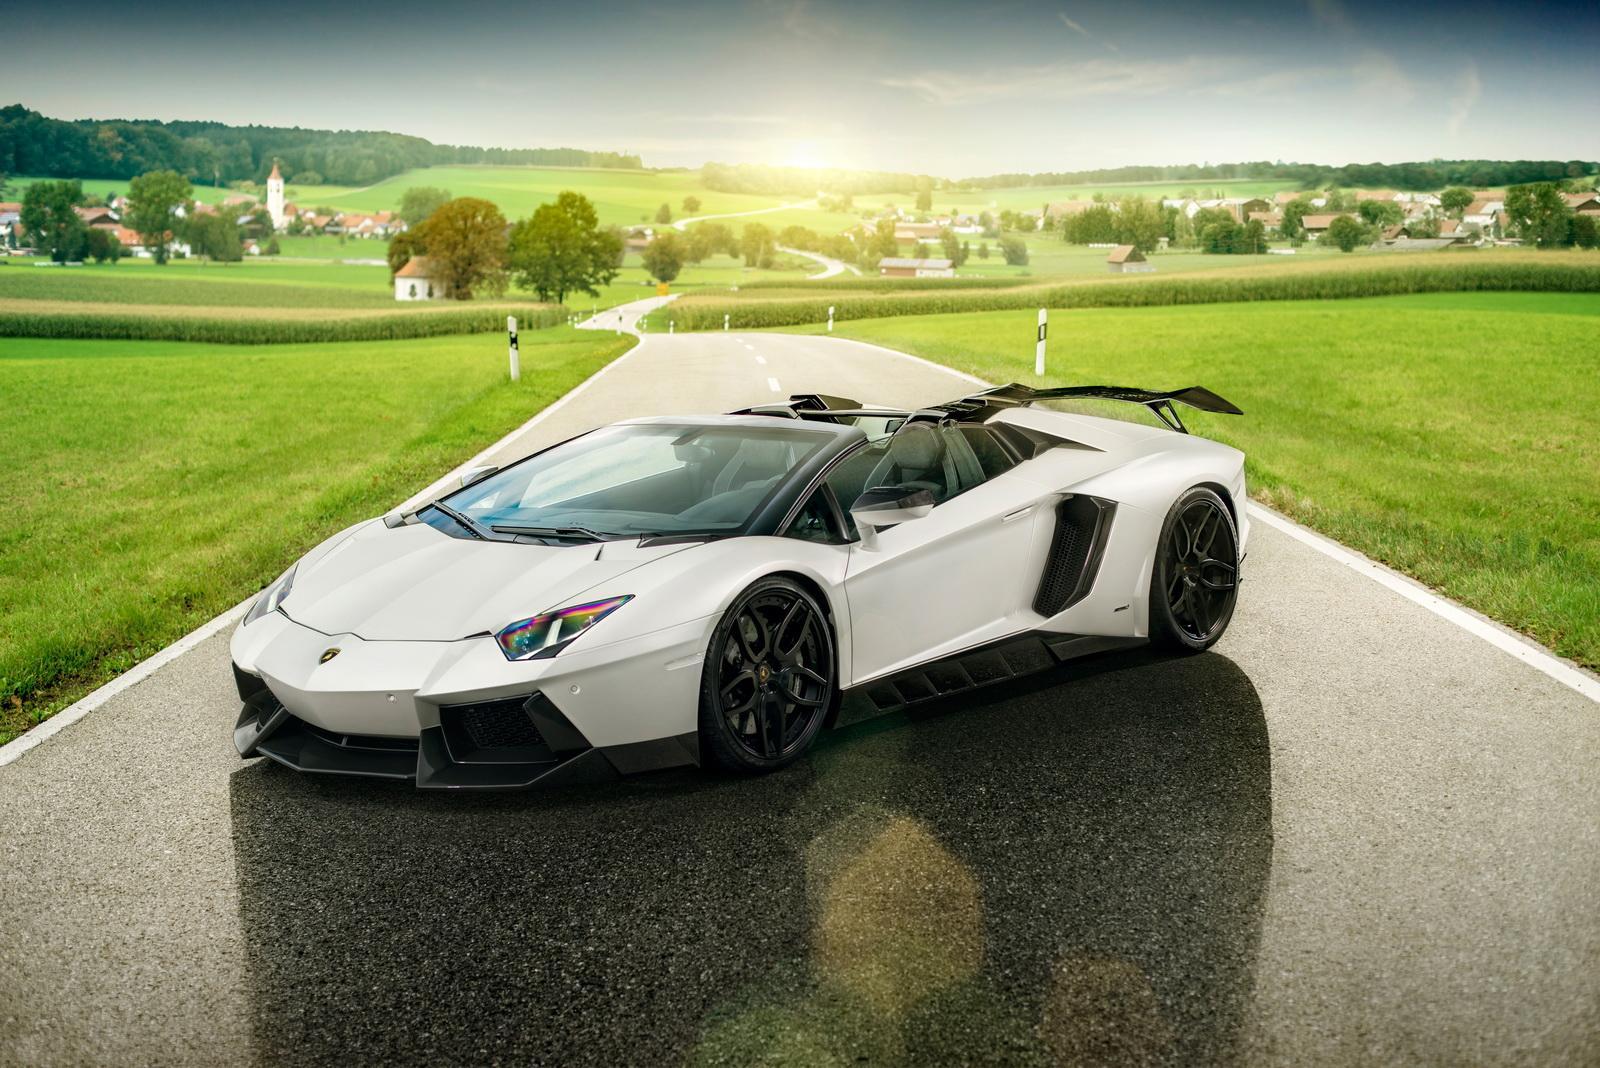 Exceptionnel ... Novitec Torado Lamborghini Aventador Roadster ...